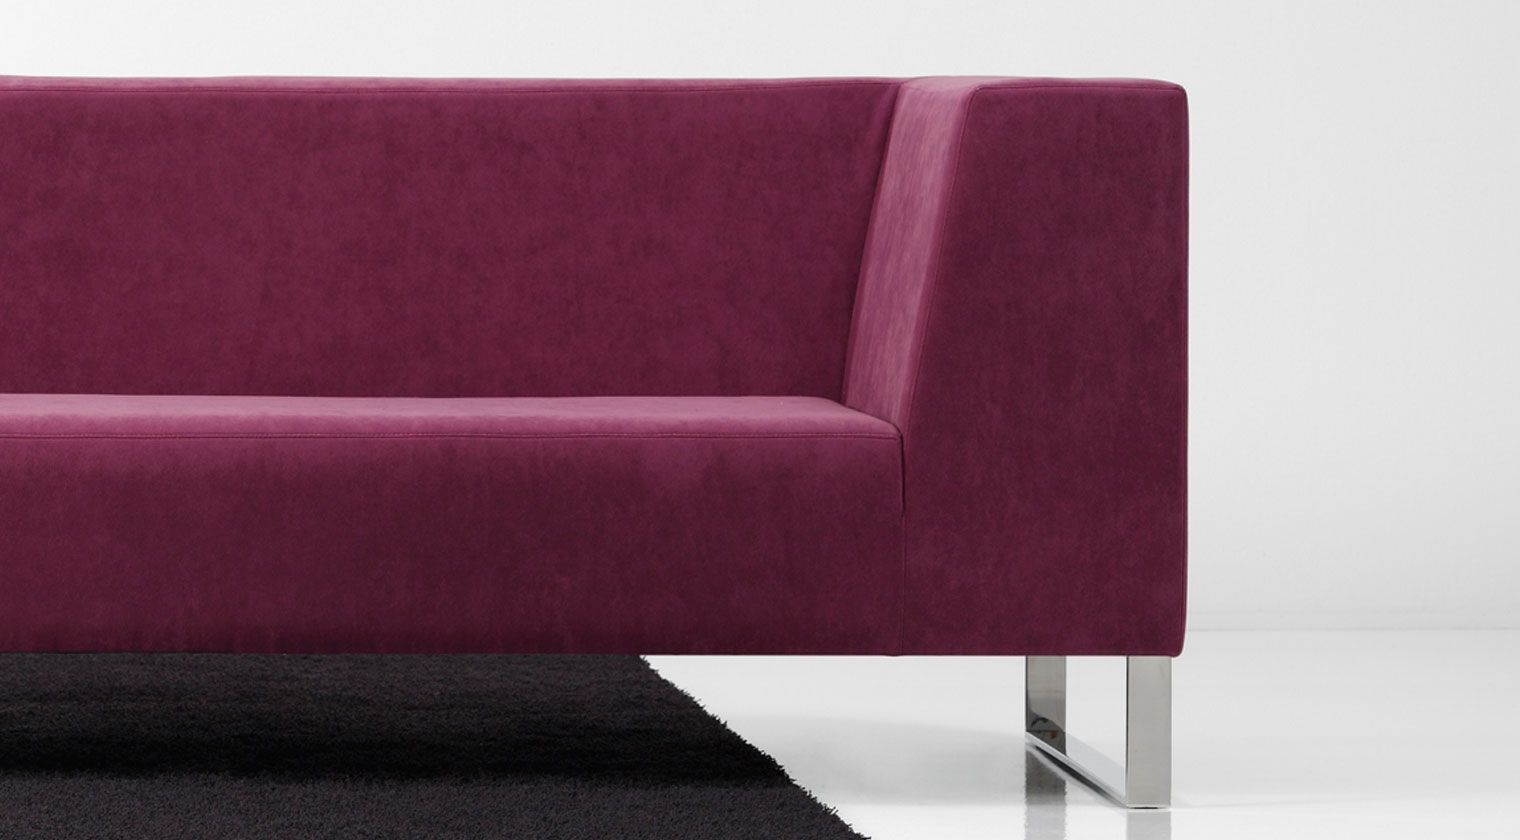 Sof 4 plazas alkadir sofas 4 plazas for Sofa gran confort precios